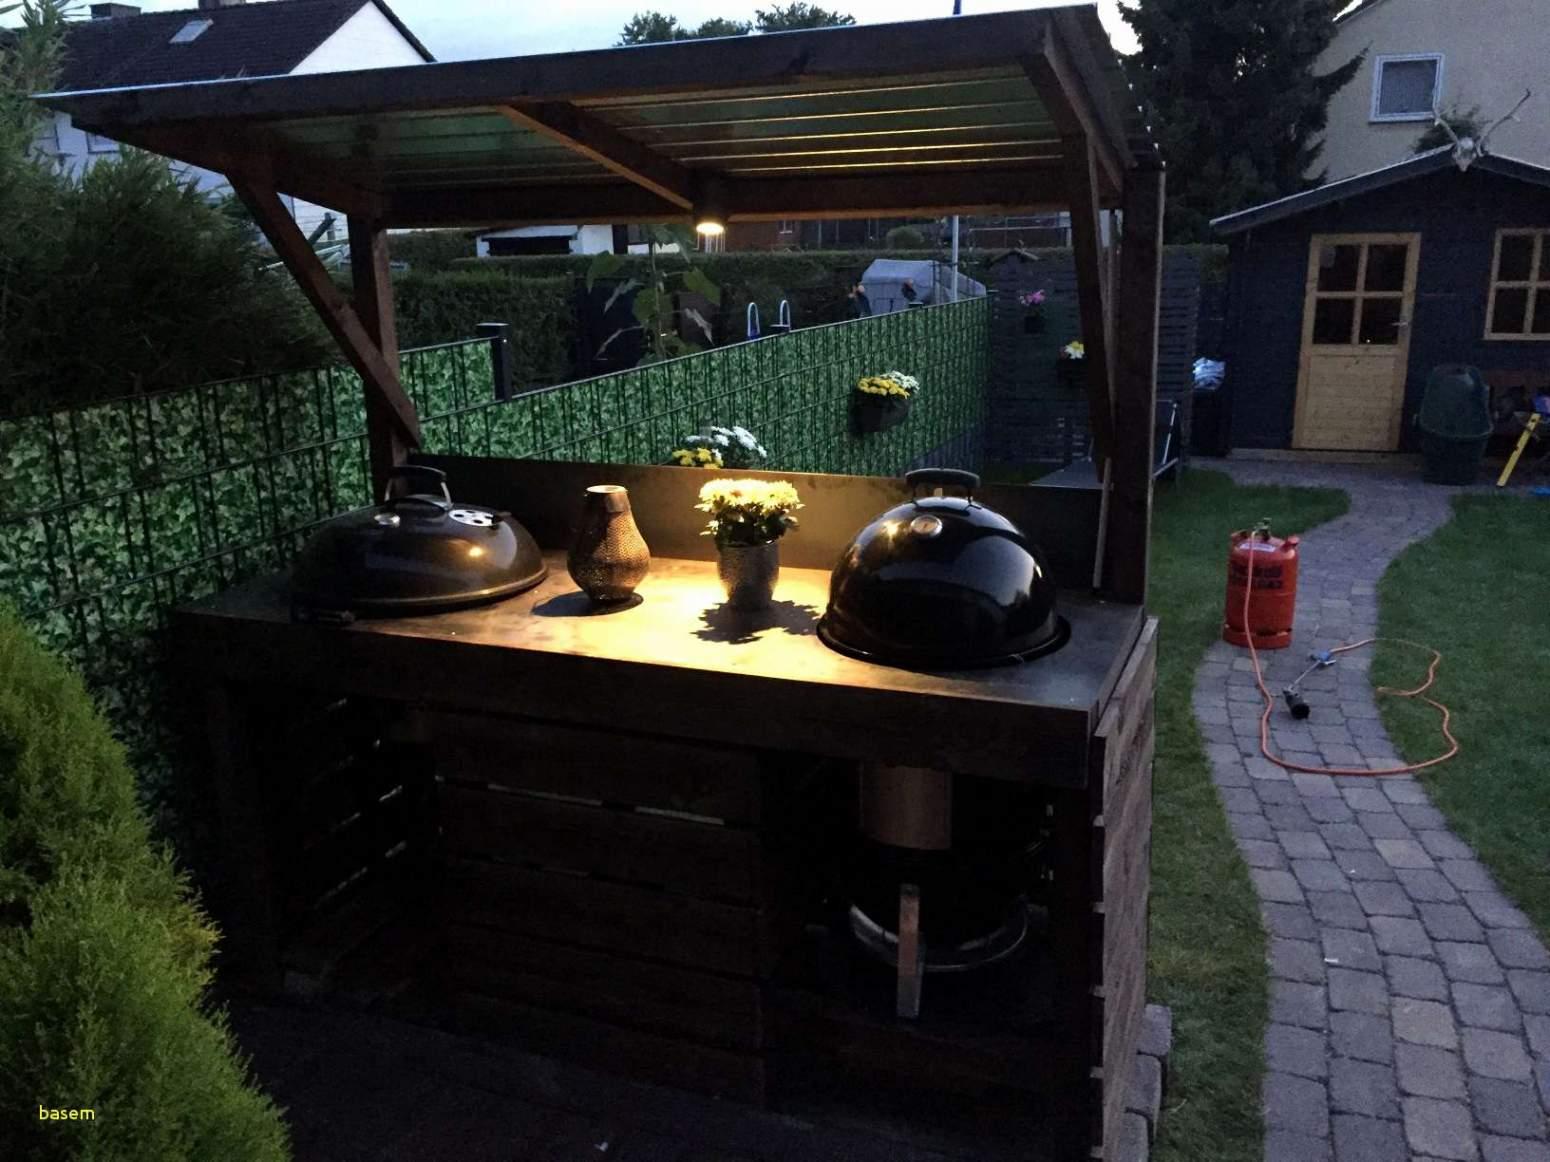 garten grillplatz neu outdoor grillplatz selber bauen luxus grillplatz bauen garten grillplatz bauen garten